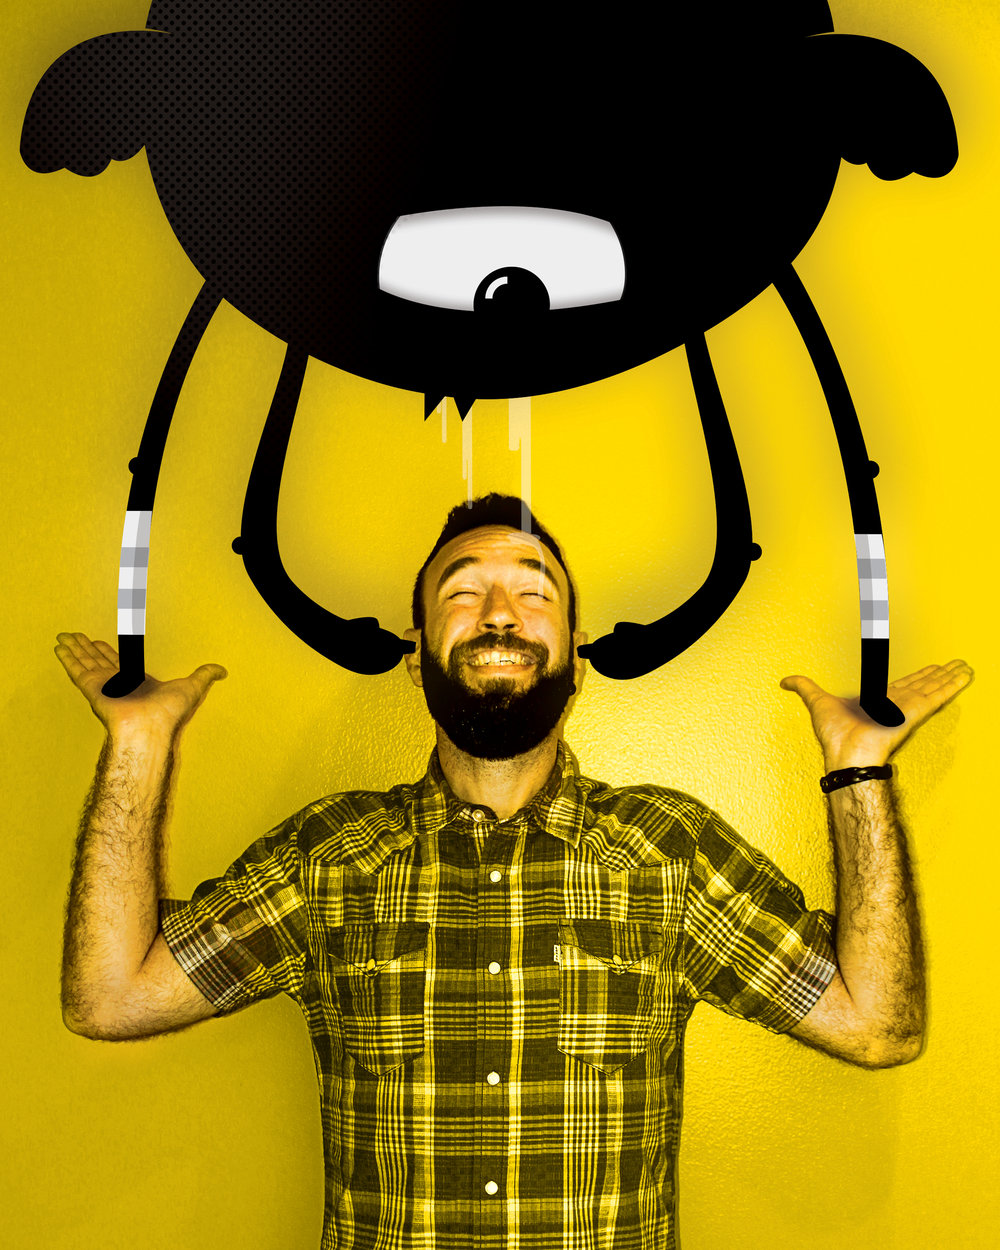 Jordan Polonsky, Director of Product Design